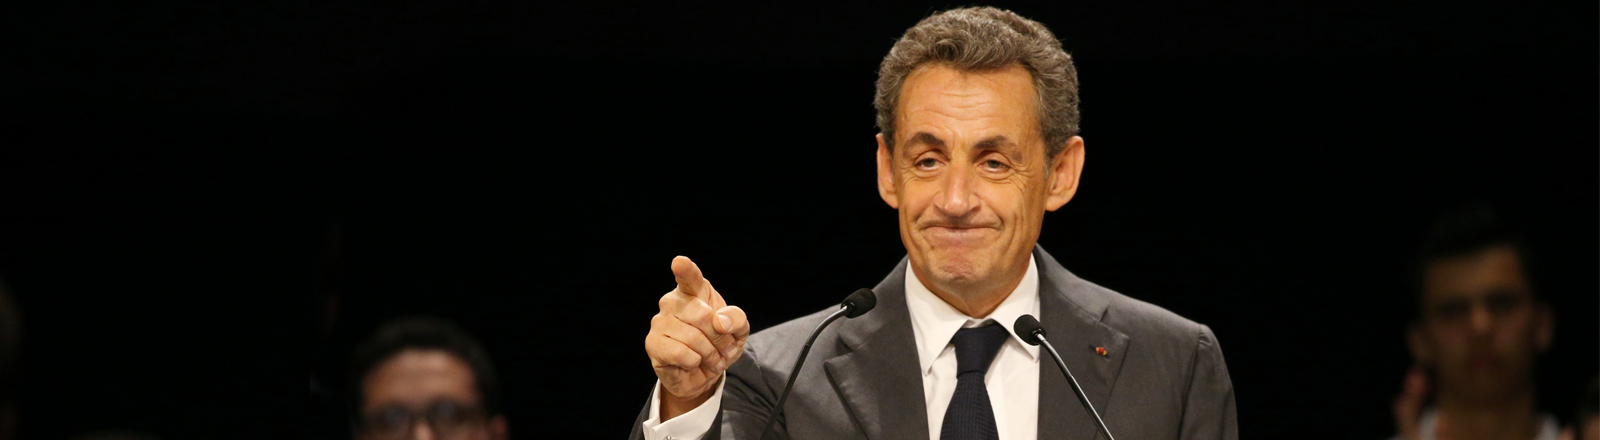 Nicolas Sarkozy bei einer Rede